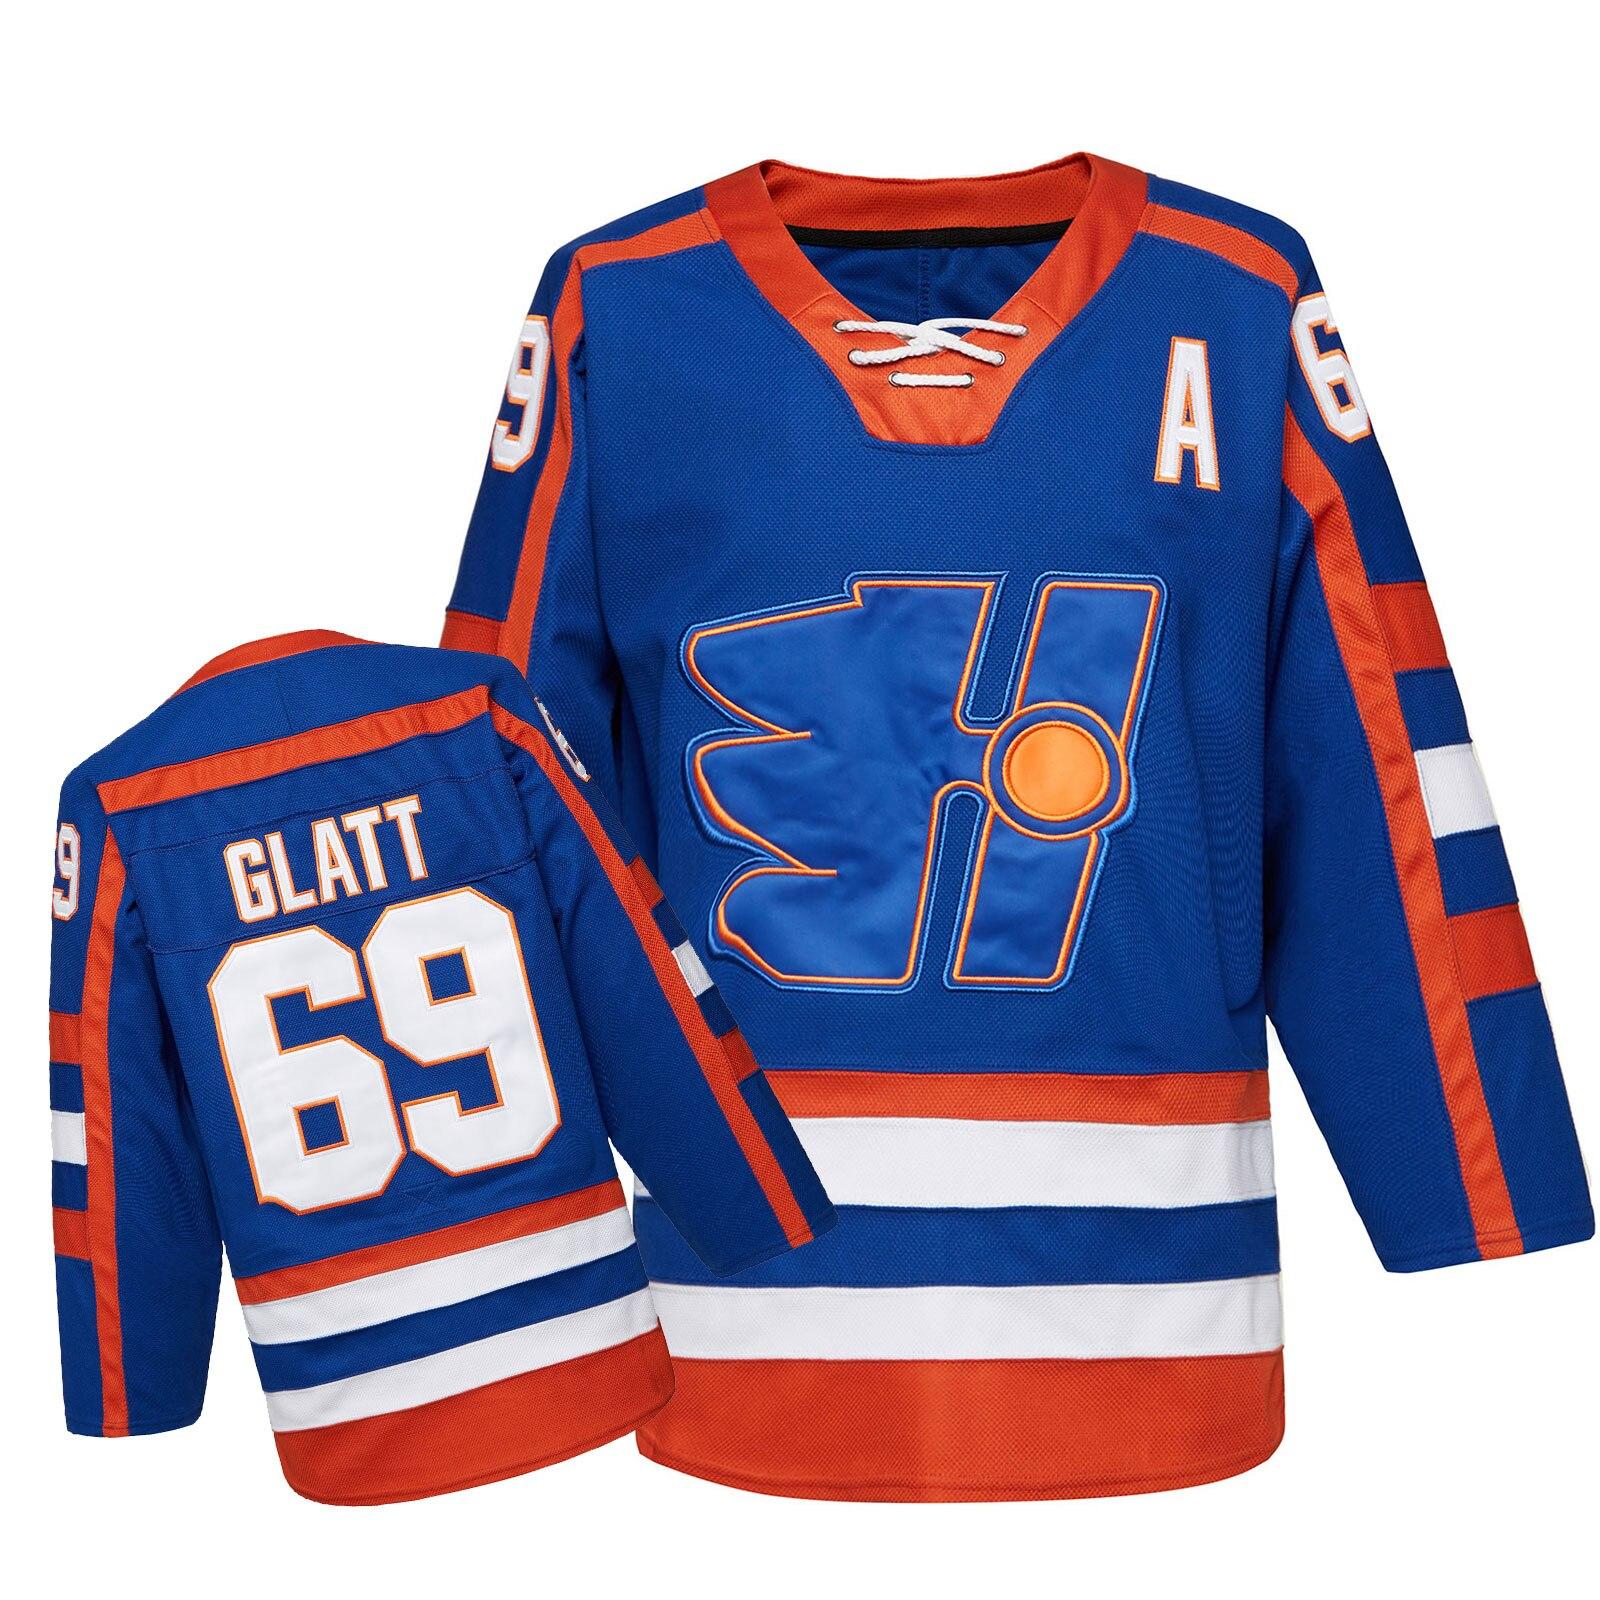 HAN DUCK Doug The Thug #69 GLATT Halifax Highlanders movie Embroidery Stitched Ice Hockey Jersey street shirt